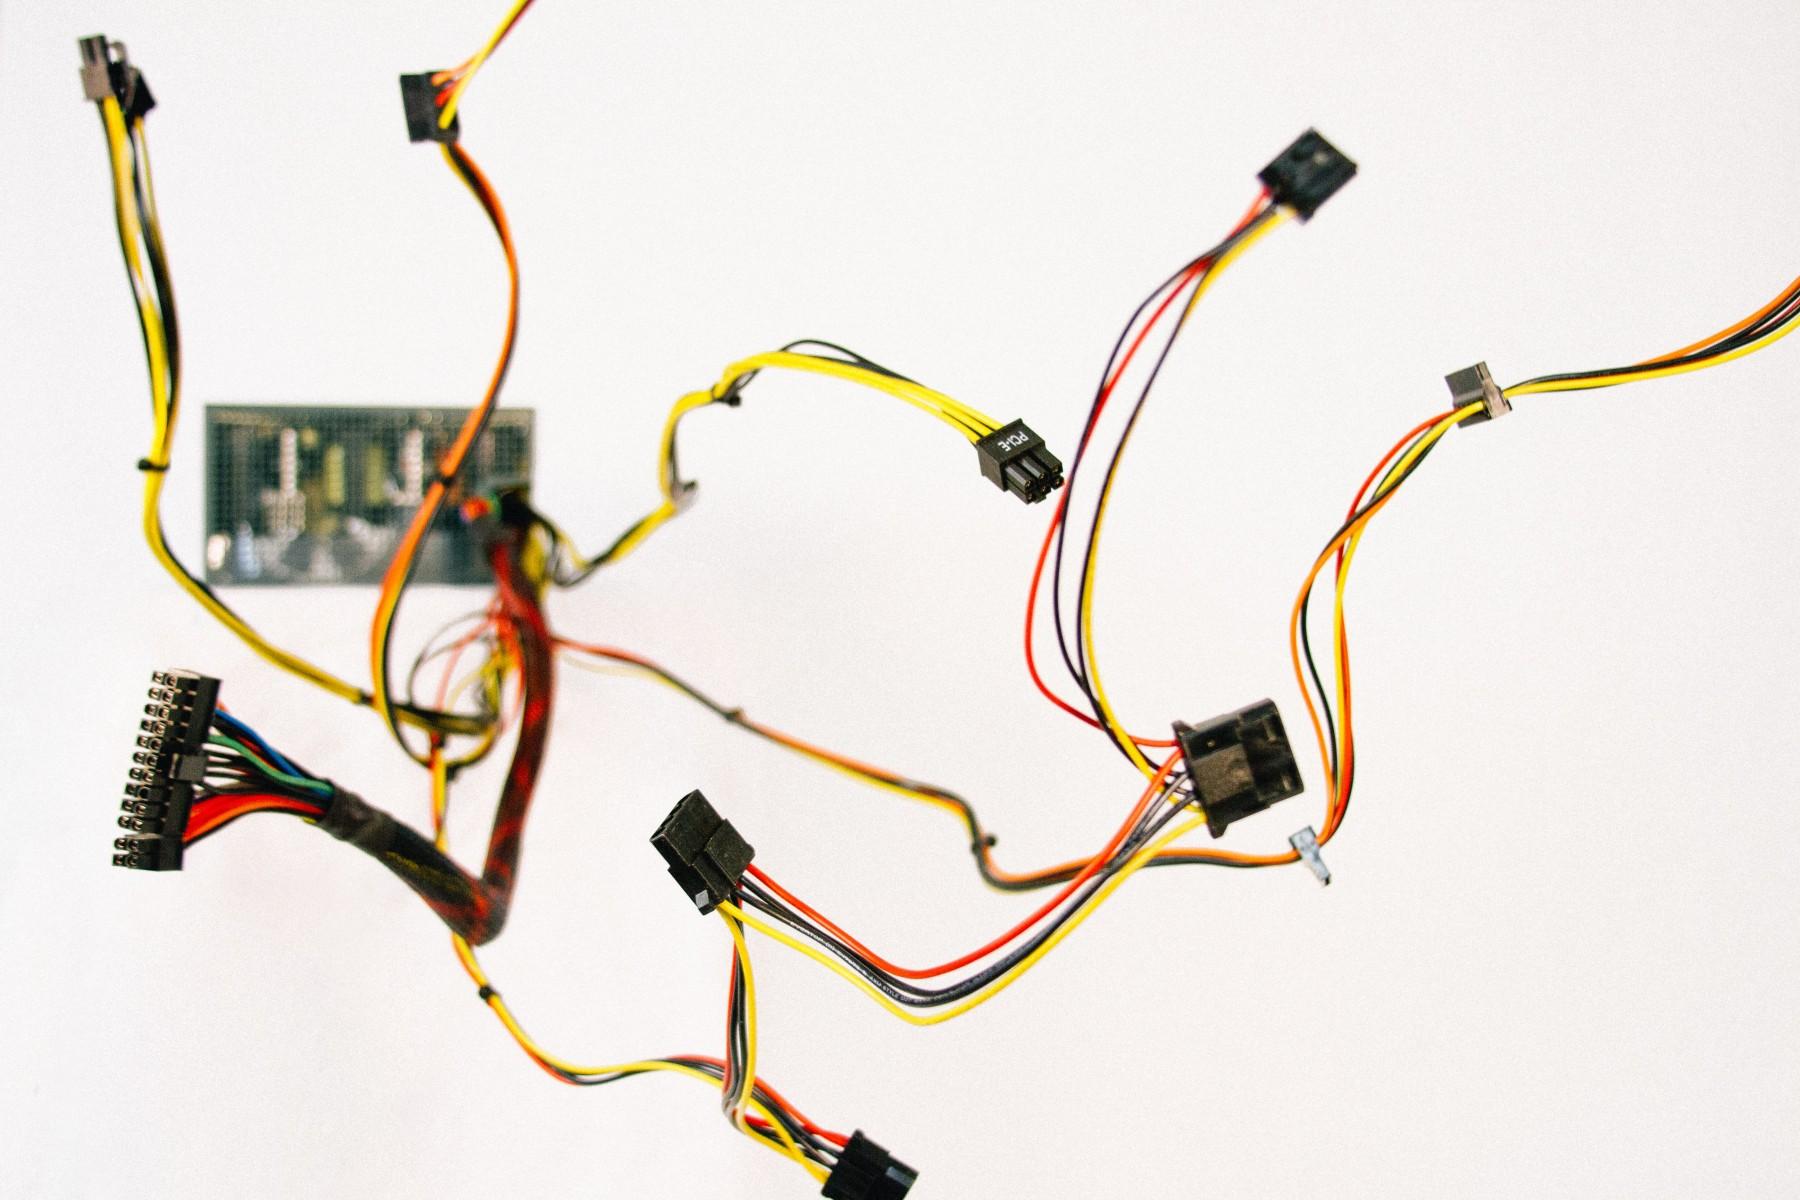 better wiring - Tim Kyle